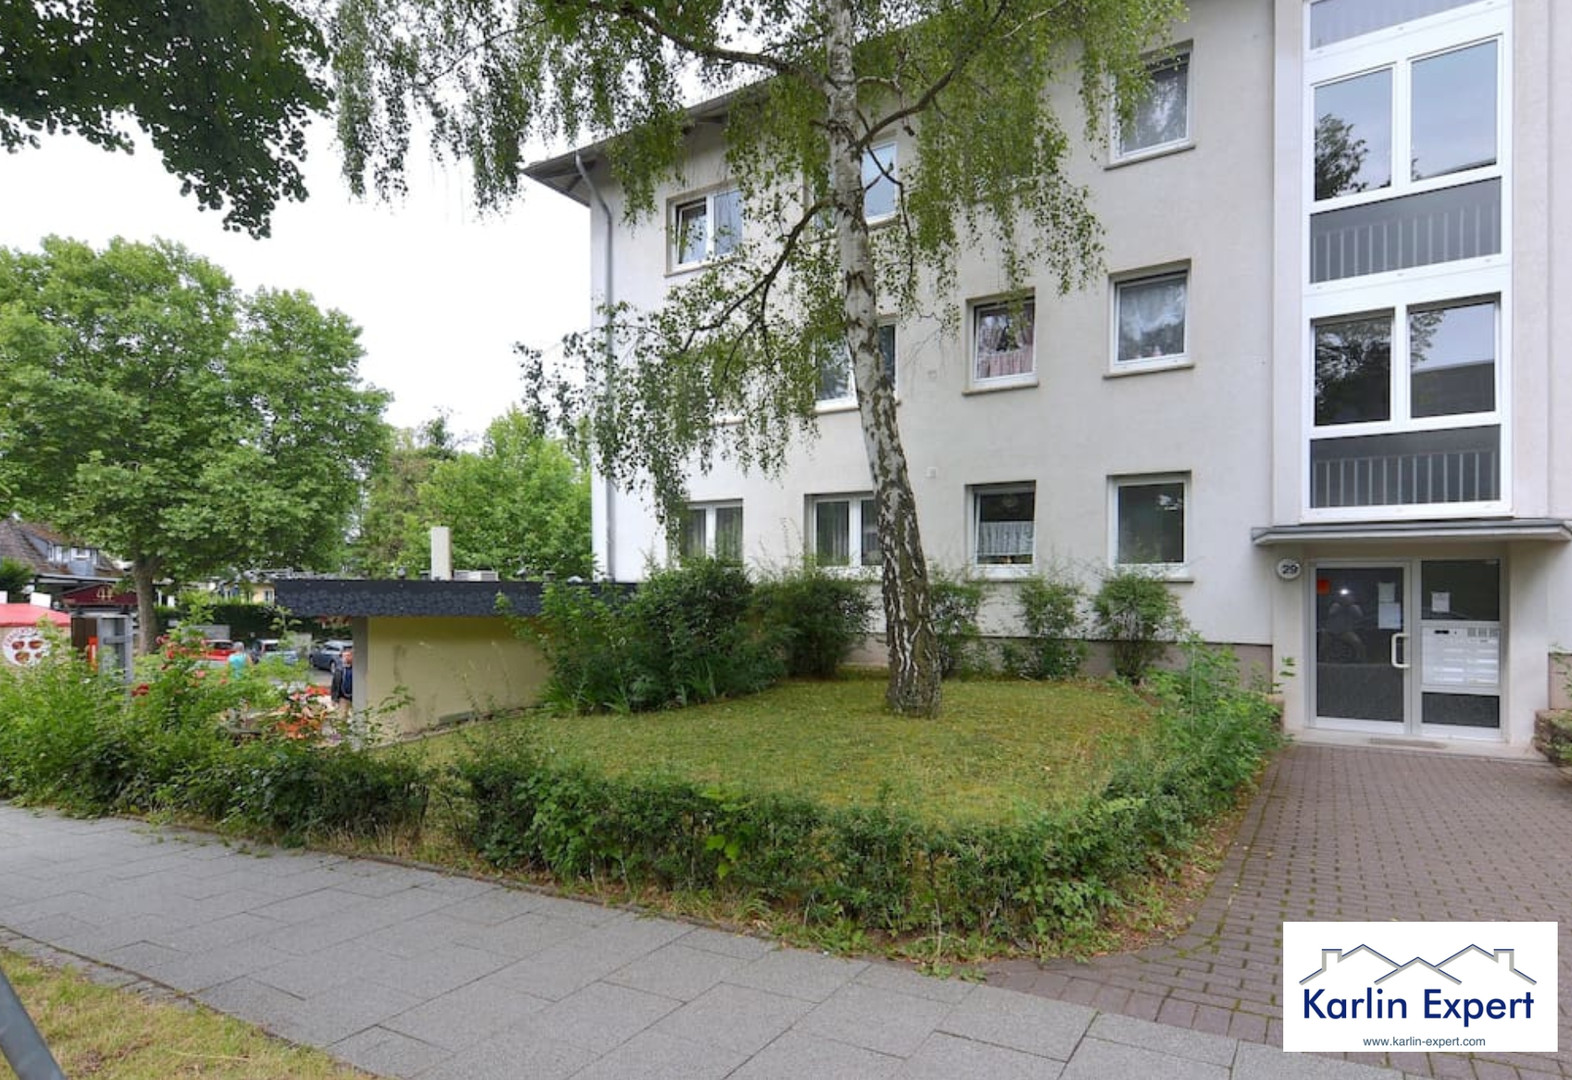 Apartment_Wiesbaden12.jpg